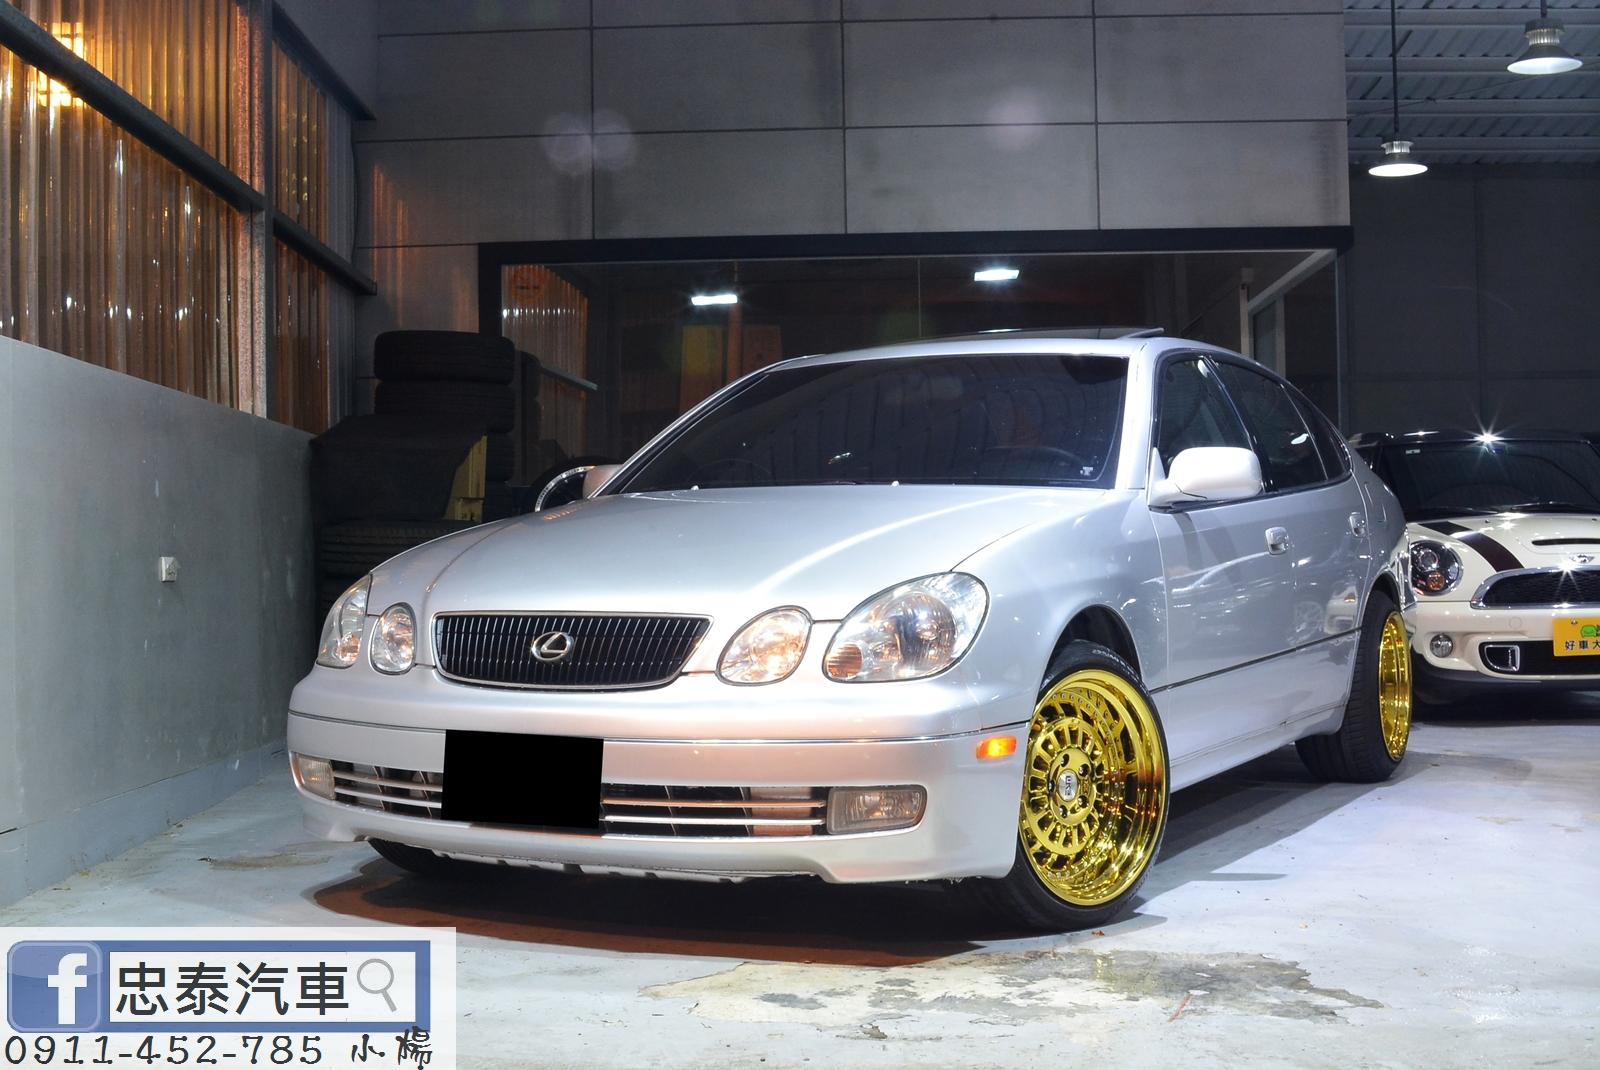 1998 Lexus 凌志 Gs